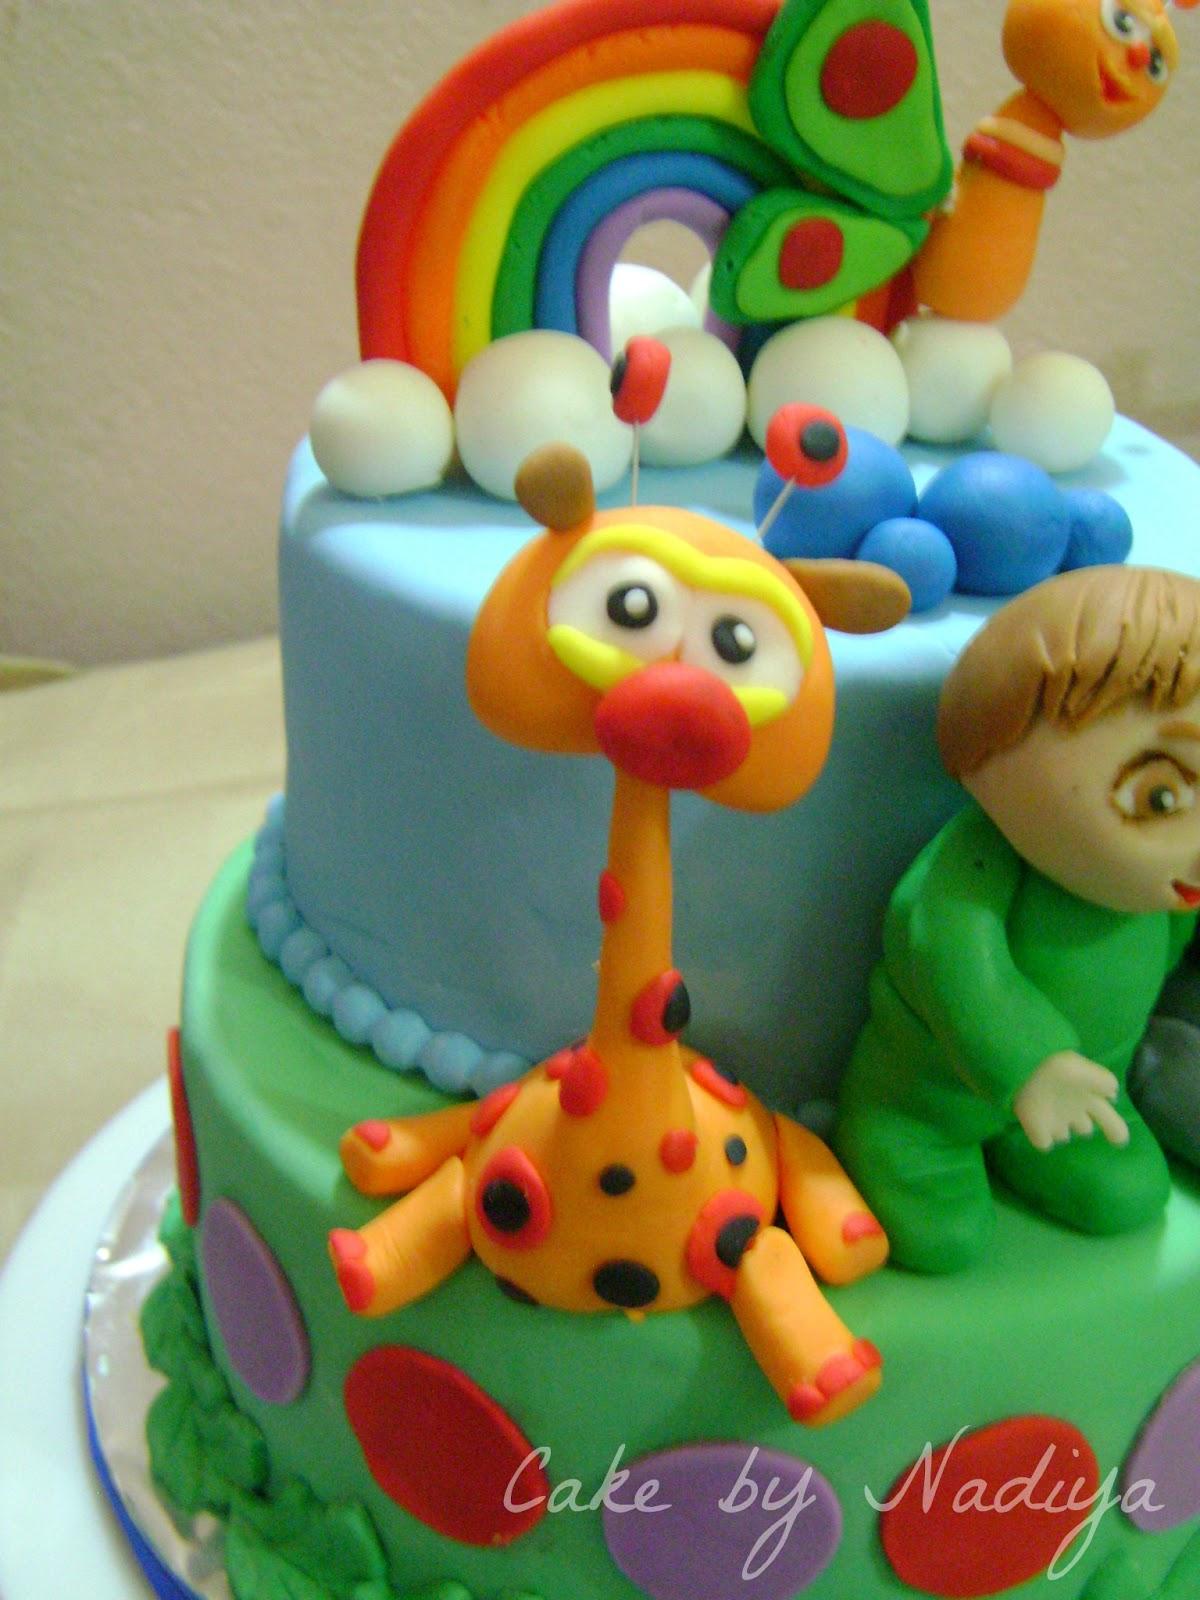 Cake Tv Show Crafts : Nadiya s Tastes Of Maldives: Baby TV cake